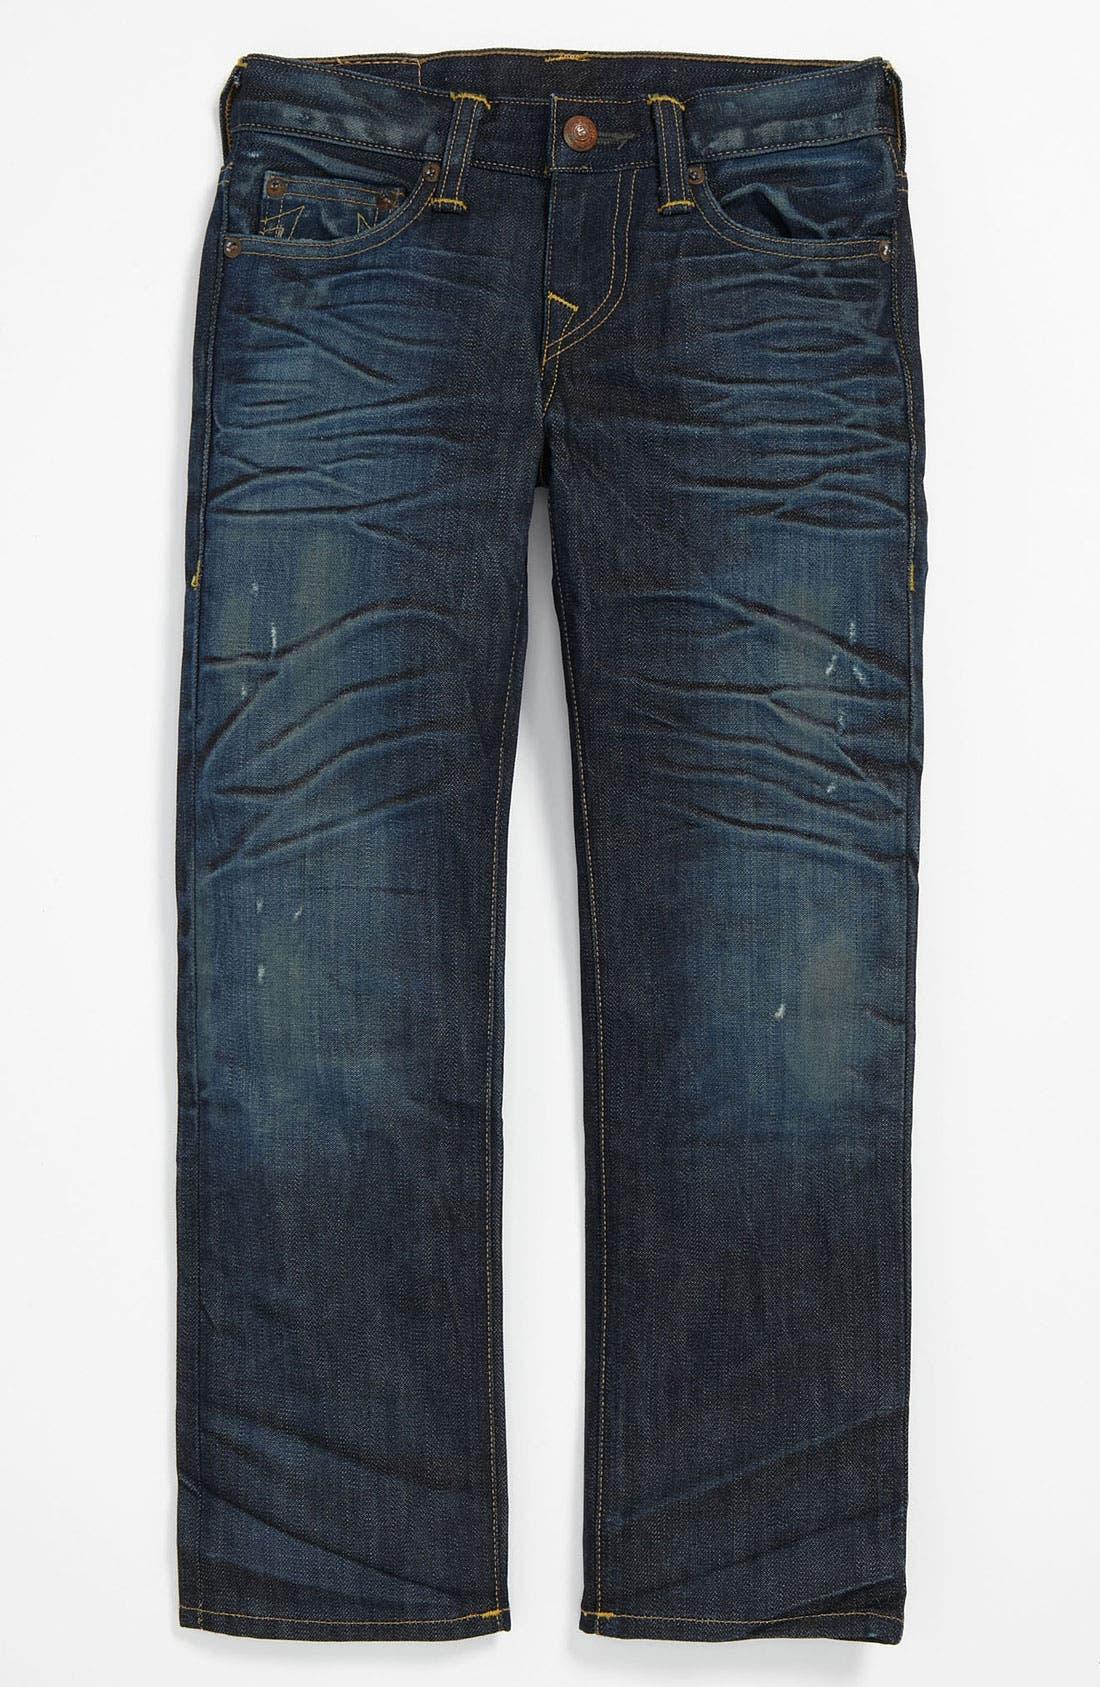 Alternate Image 2  - True Religion Brand Jeans 'Herbie Phoenix' Jeans (Big Boys)